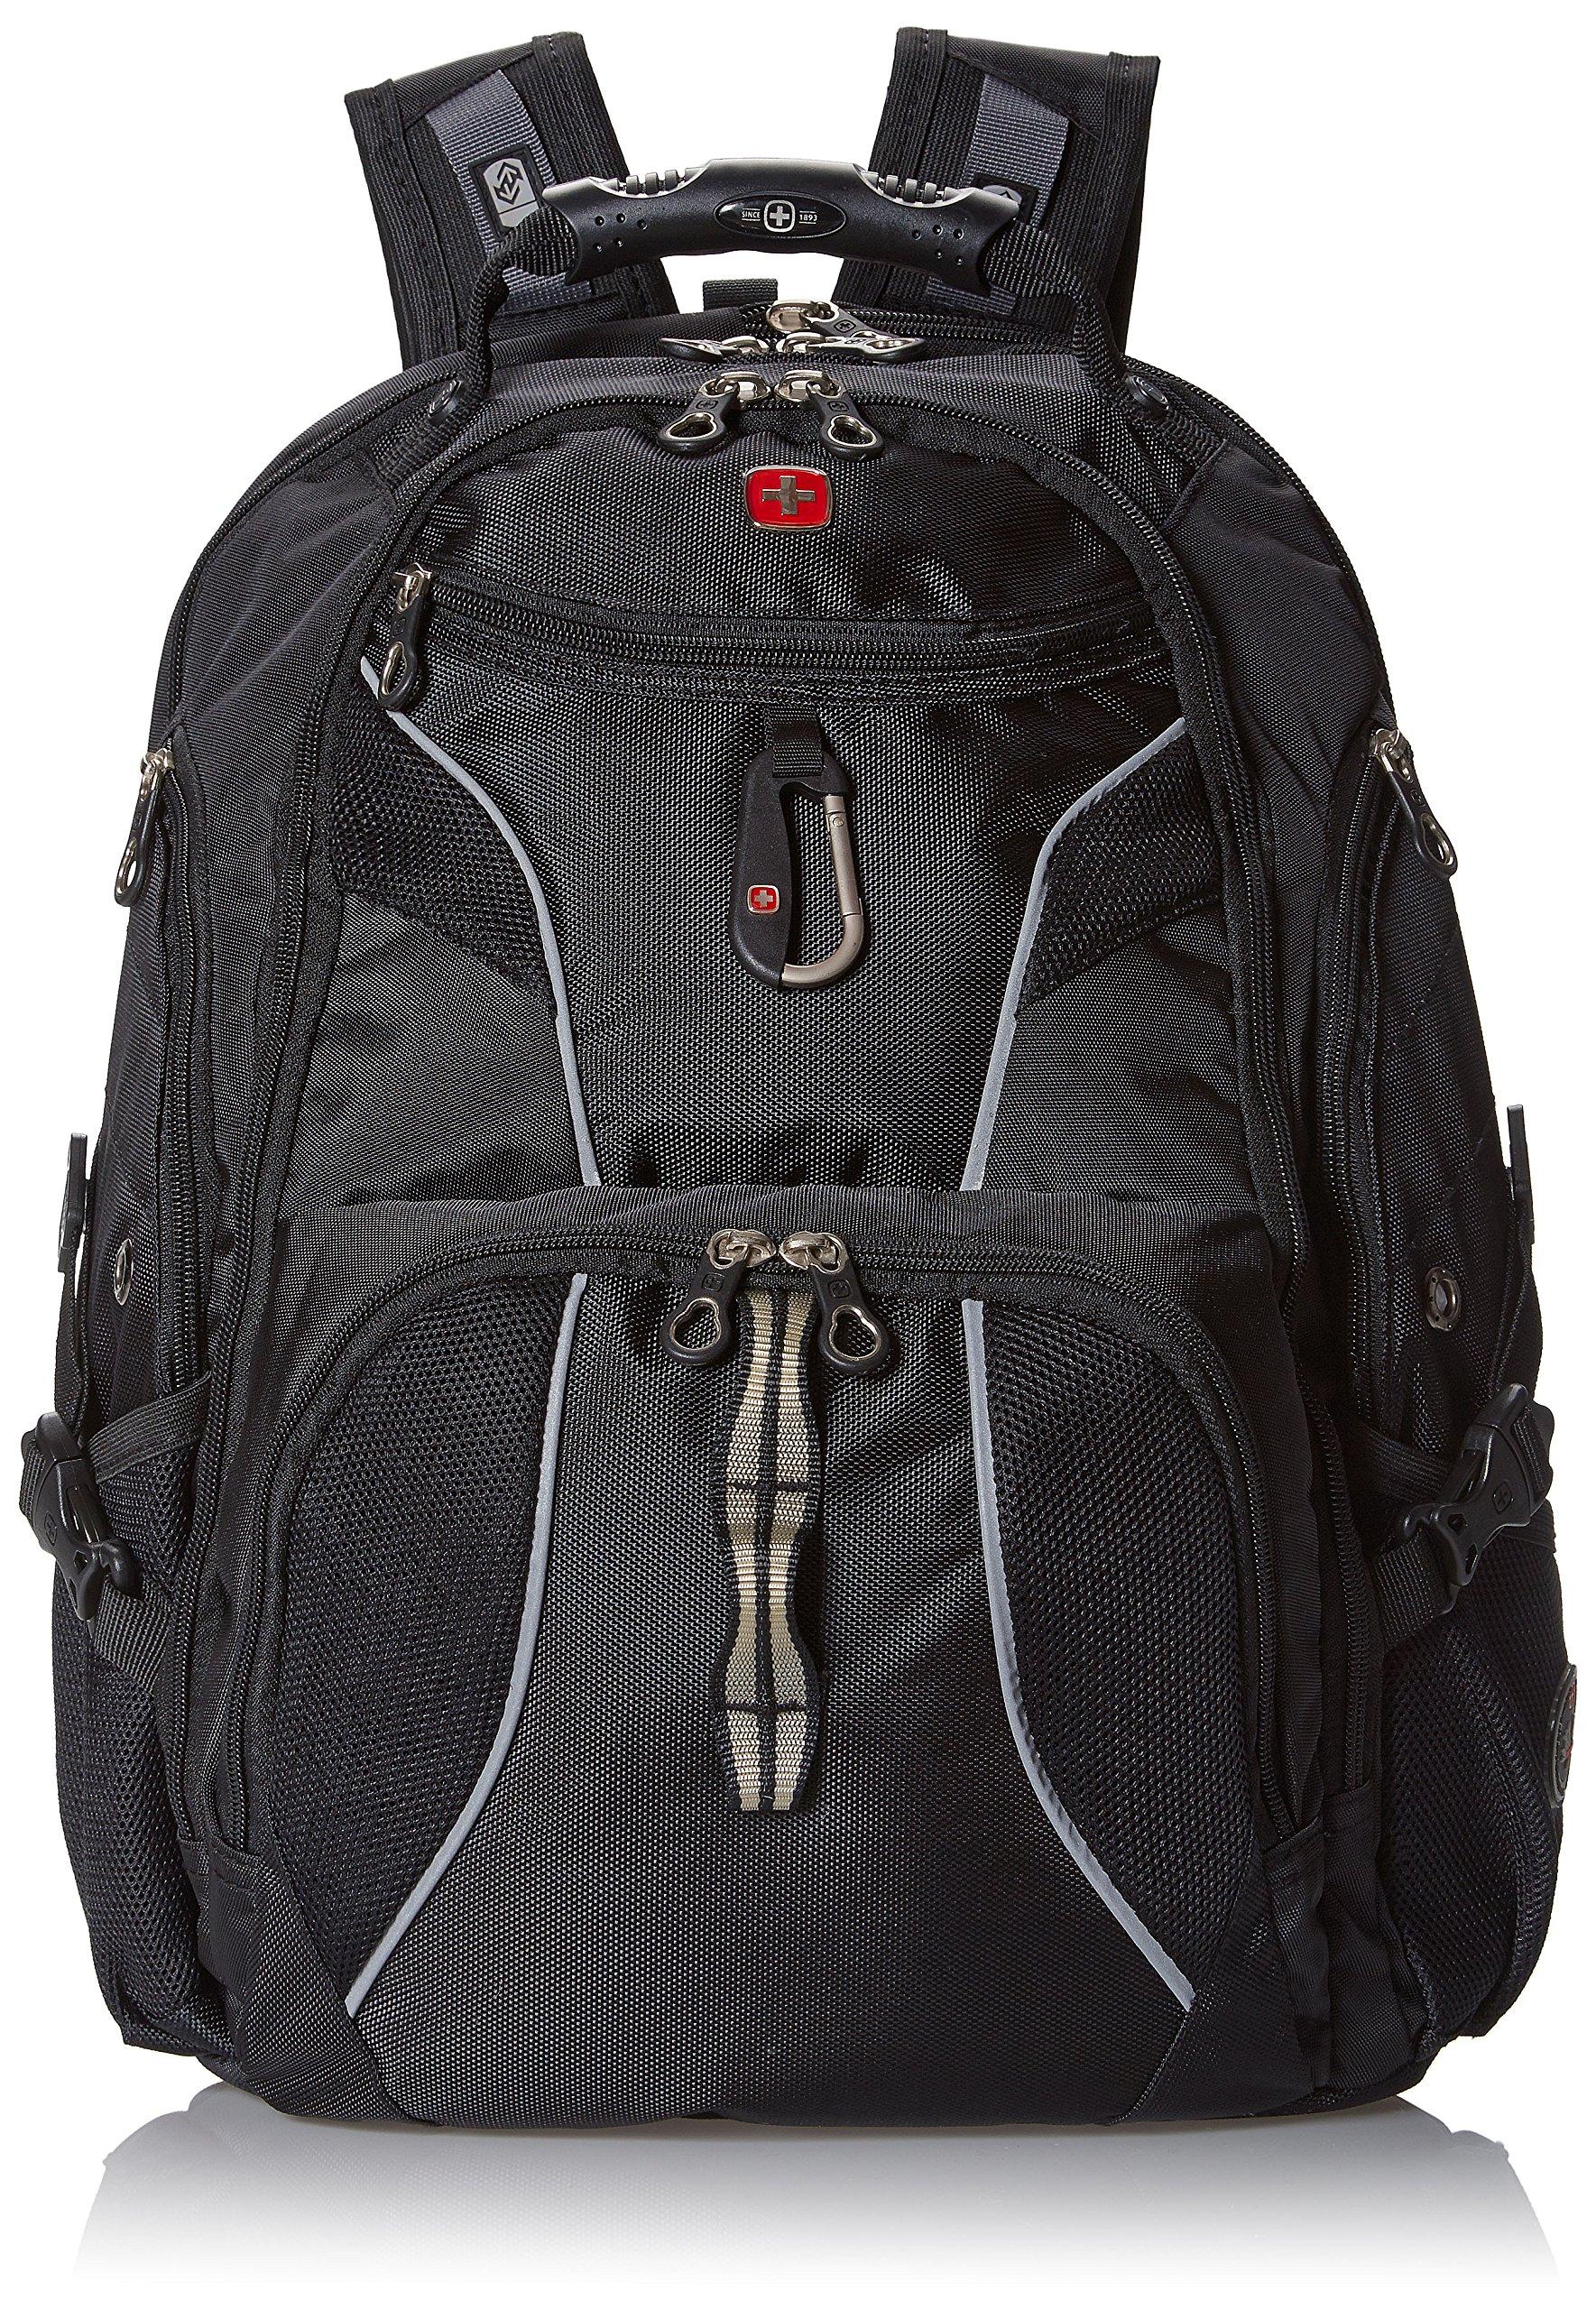 Swiss Gear SA1923 Black TSA Friendly ScanSmart Laptop Backpack - Fits Most 15 Inch Laptops and Tablets by Swiss Gear